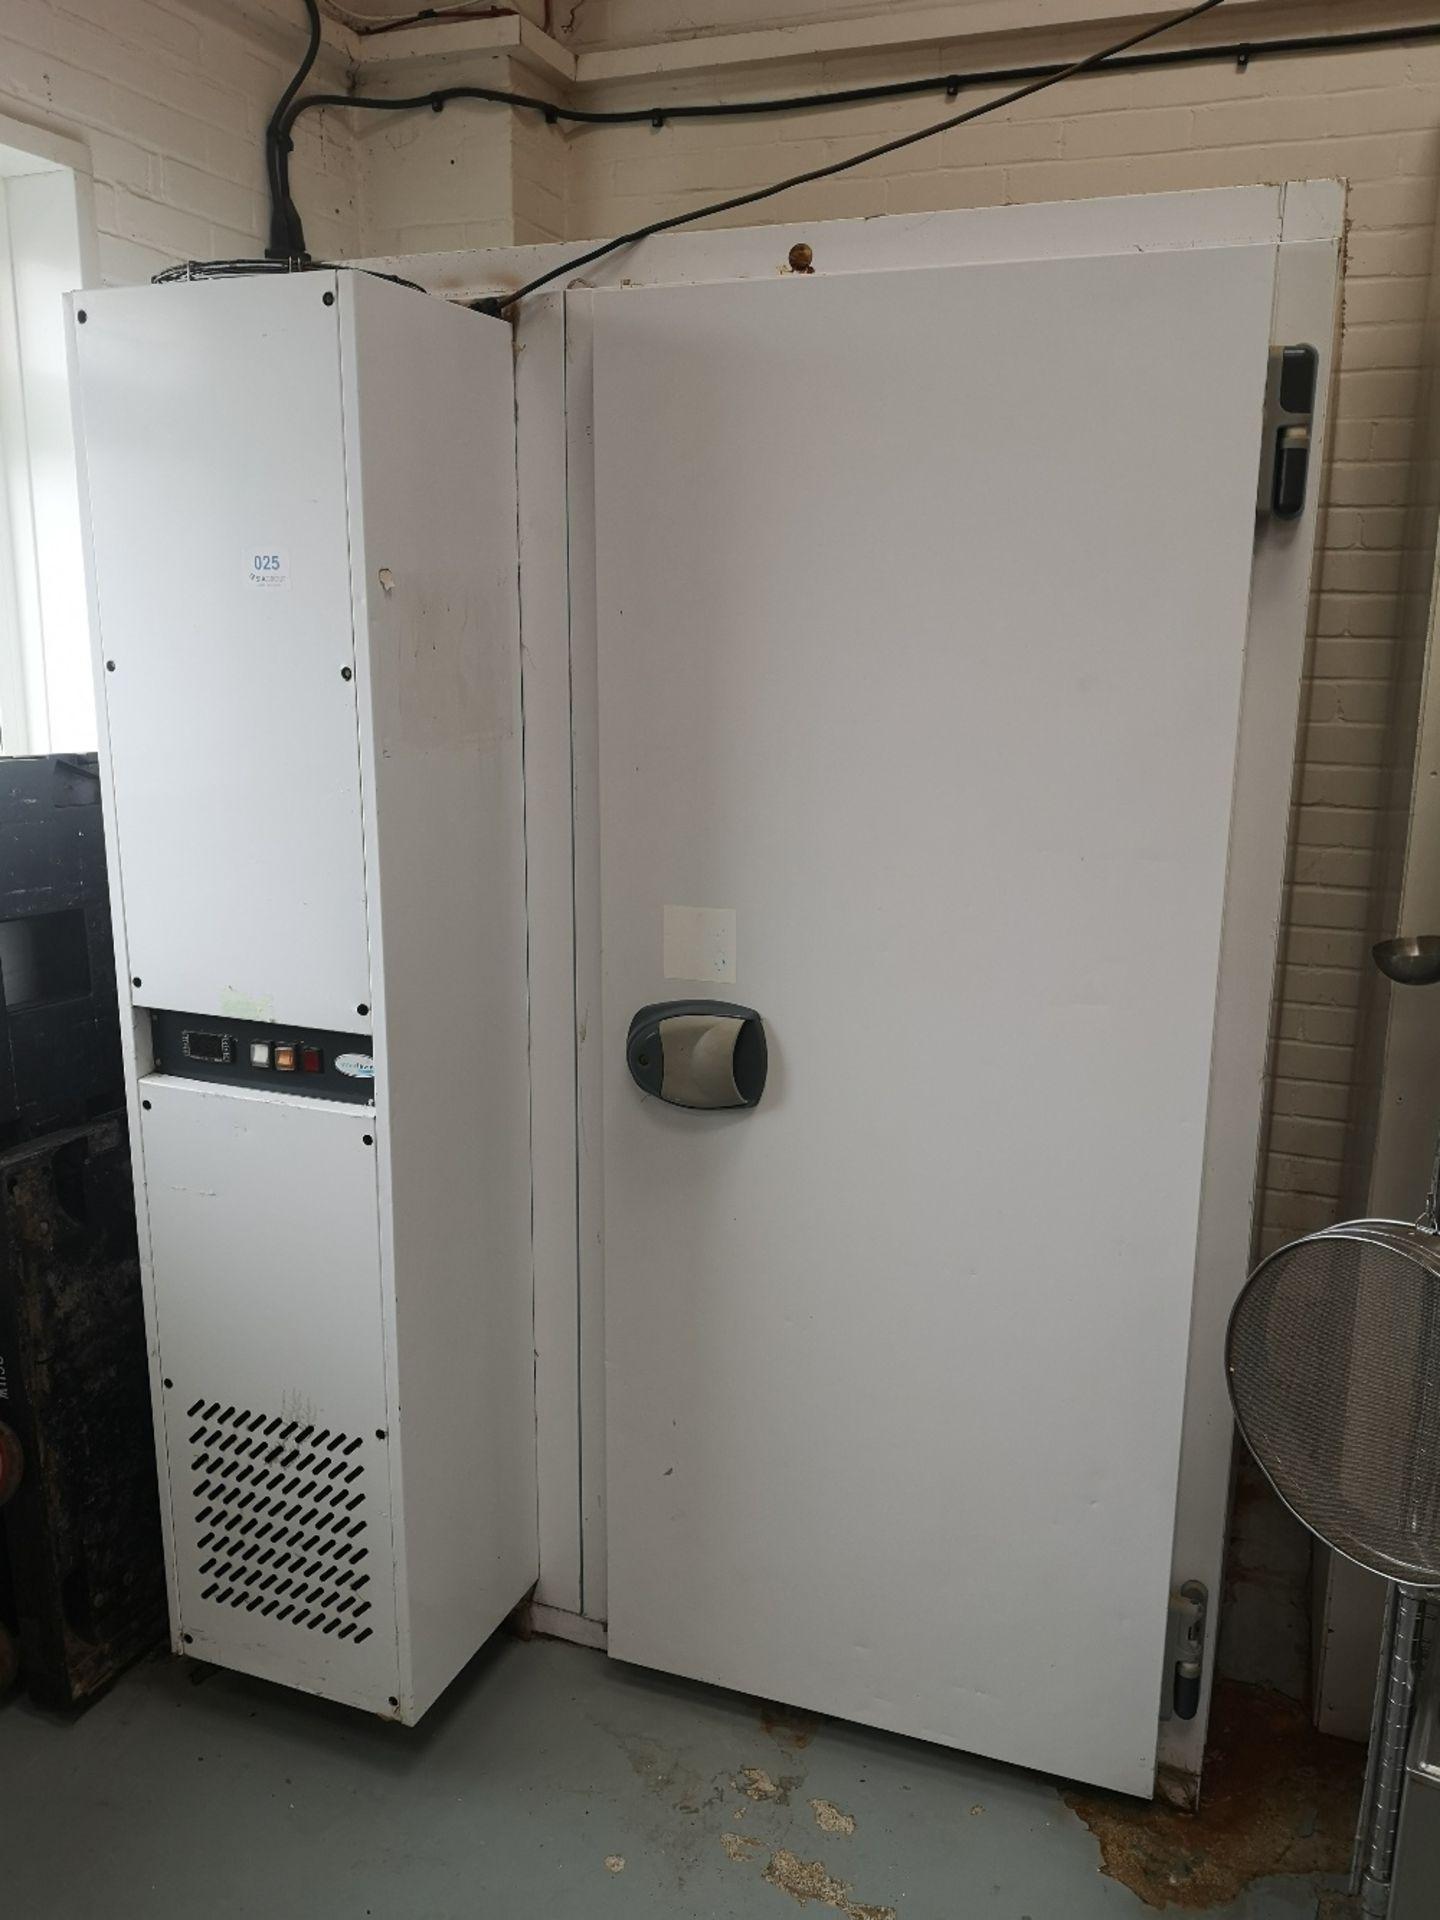 Interlevin Freestanding Cold Room - Image 2 of 6